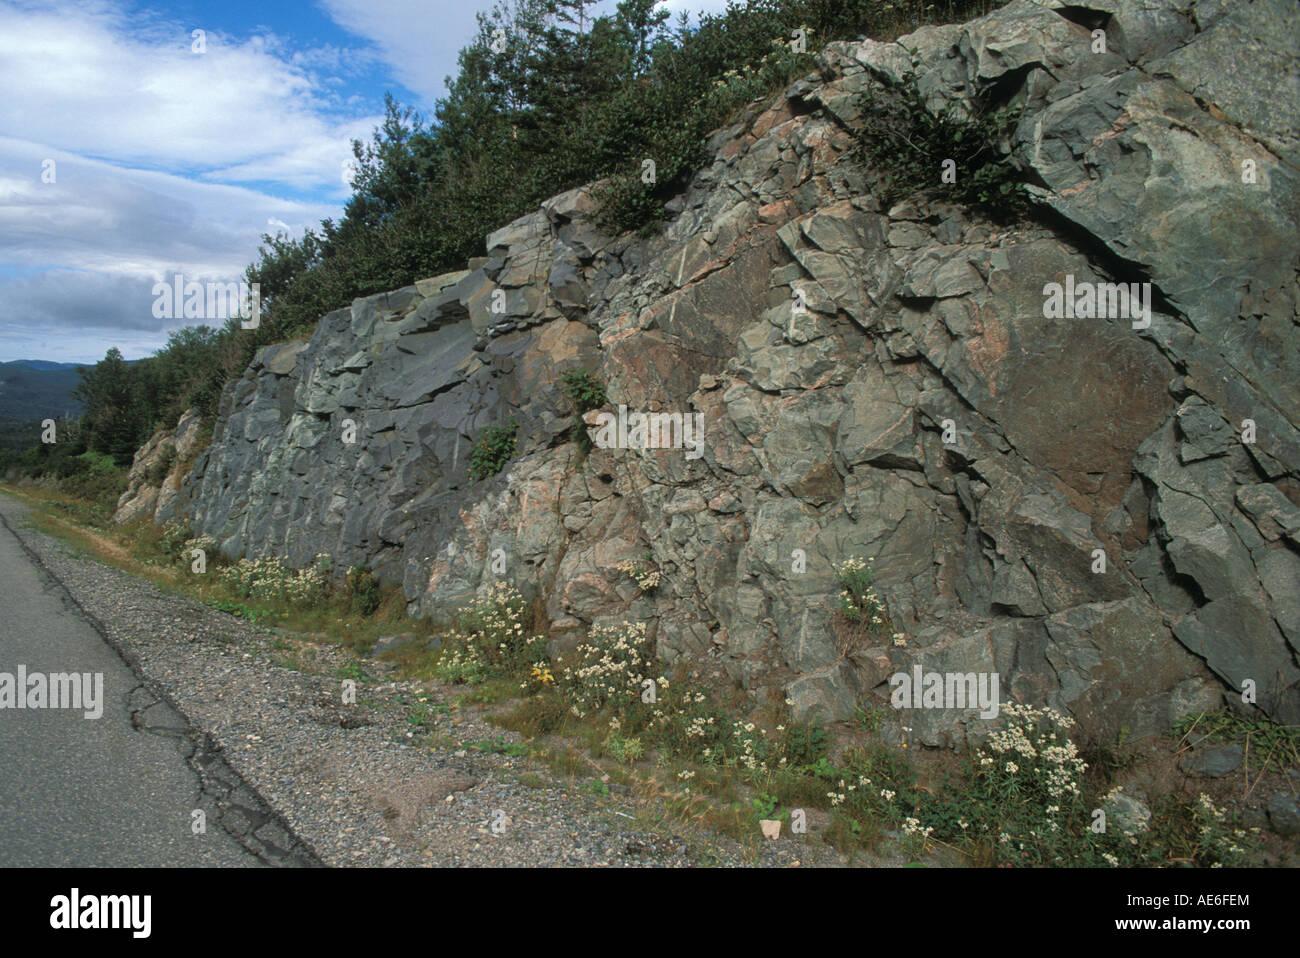 Road cut exposes uniformity layer of rocks Gros Morne National Park Newfoundland Canada - Stock Image